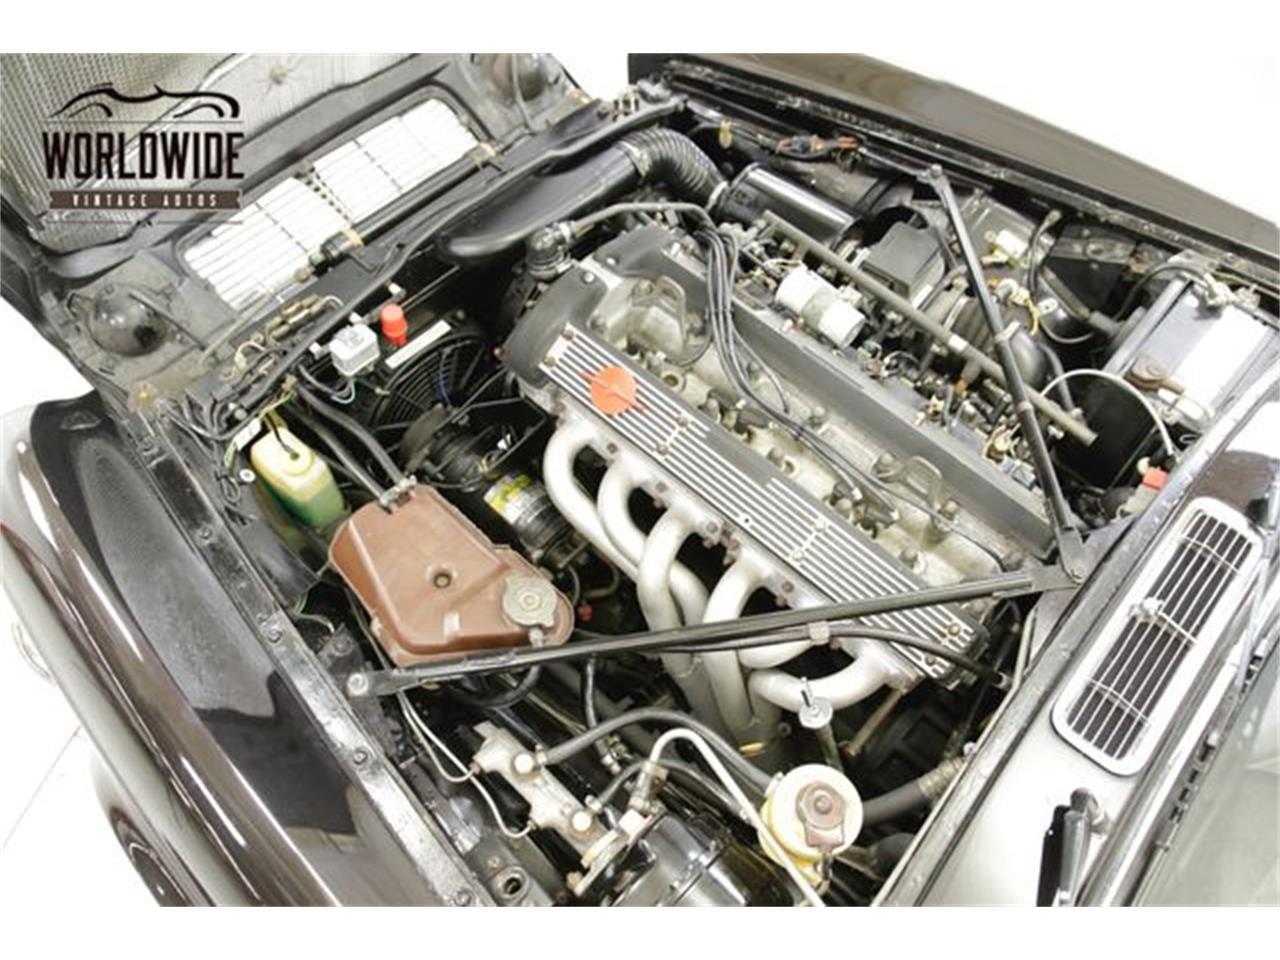 Large Picture of '76 Jaguar XJ6 located in Denver  Colorado - $28,900.00 - PSG5